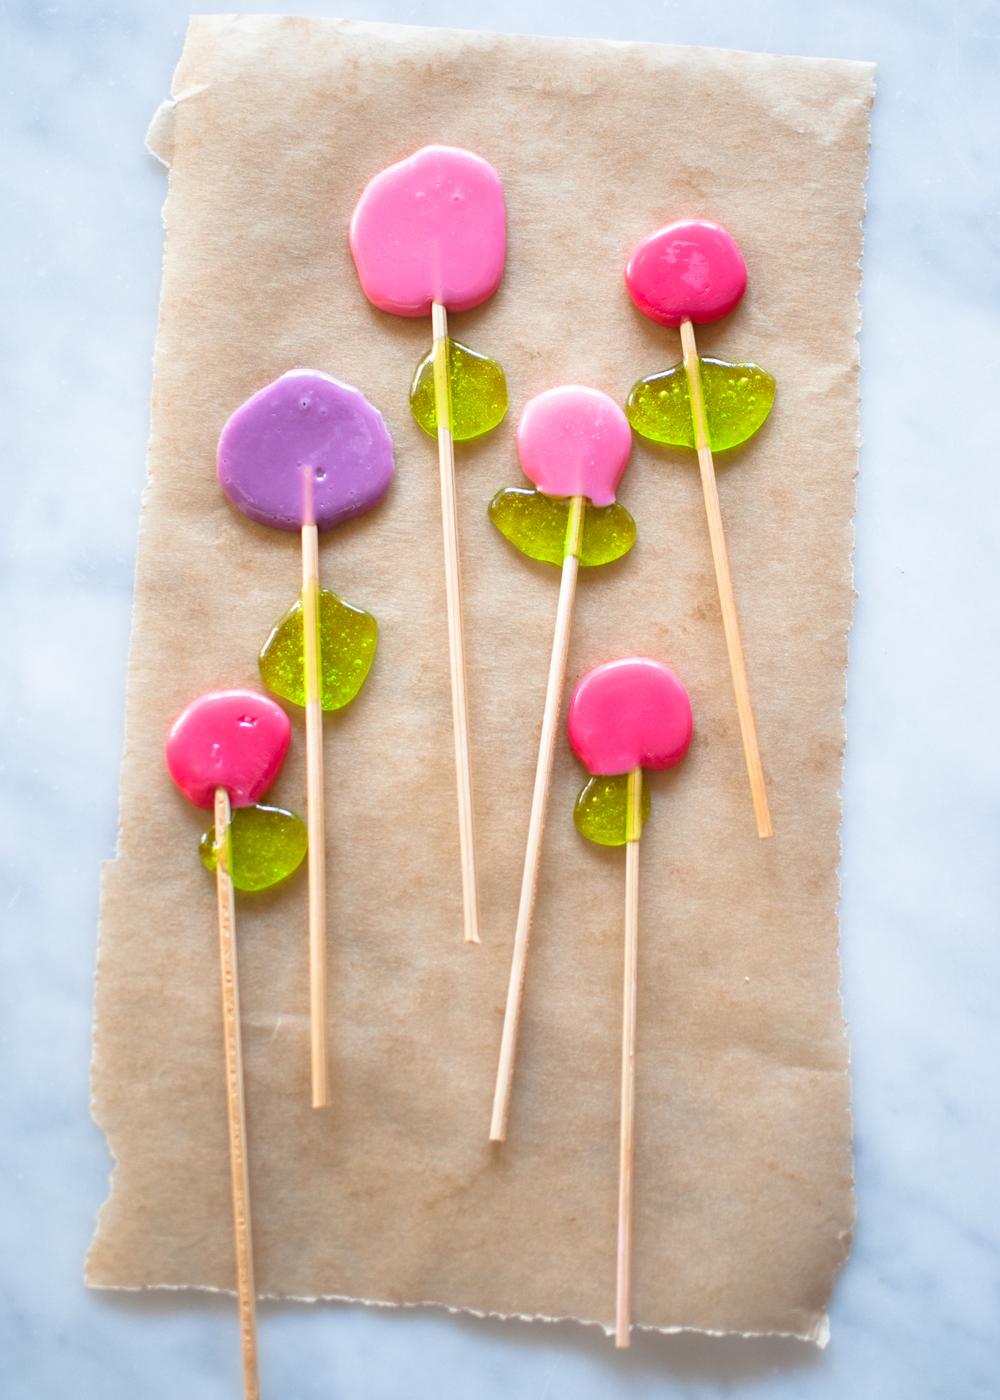 Candy-Aisle-Crafts-Dot-Flower-Lollipops